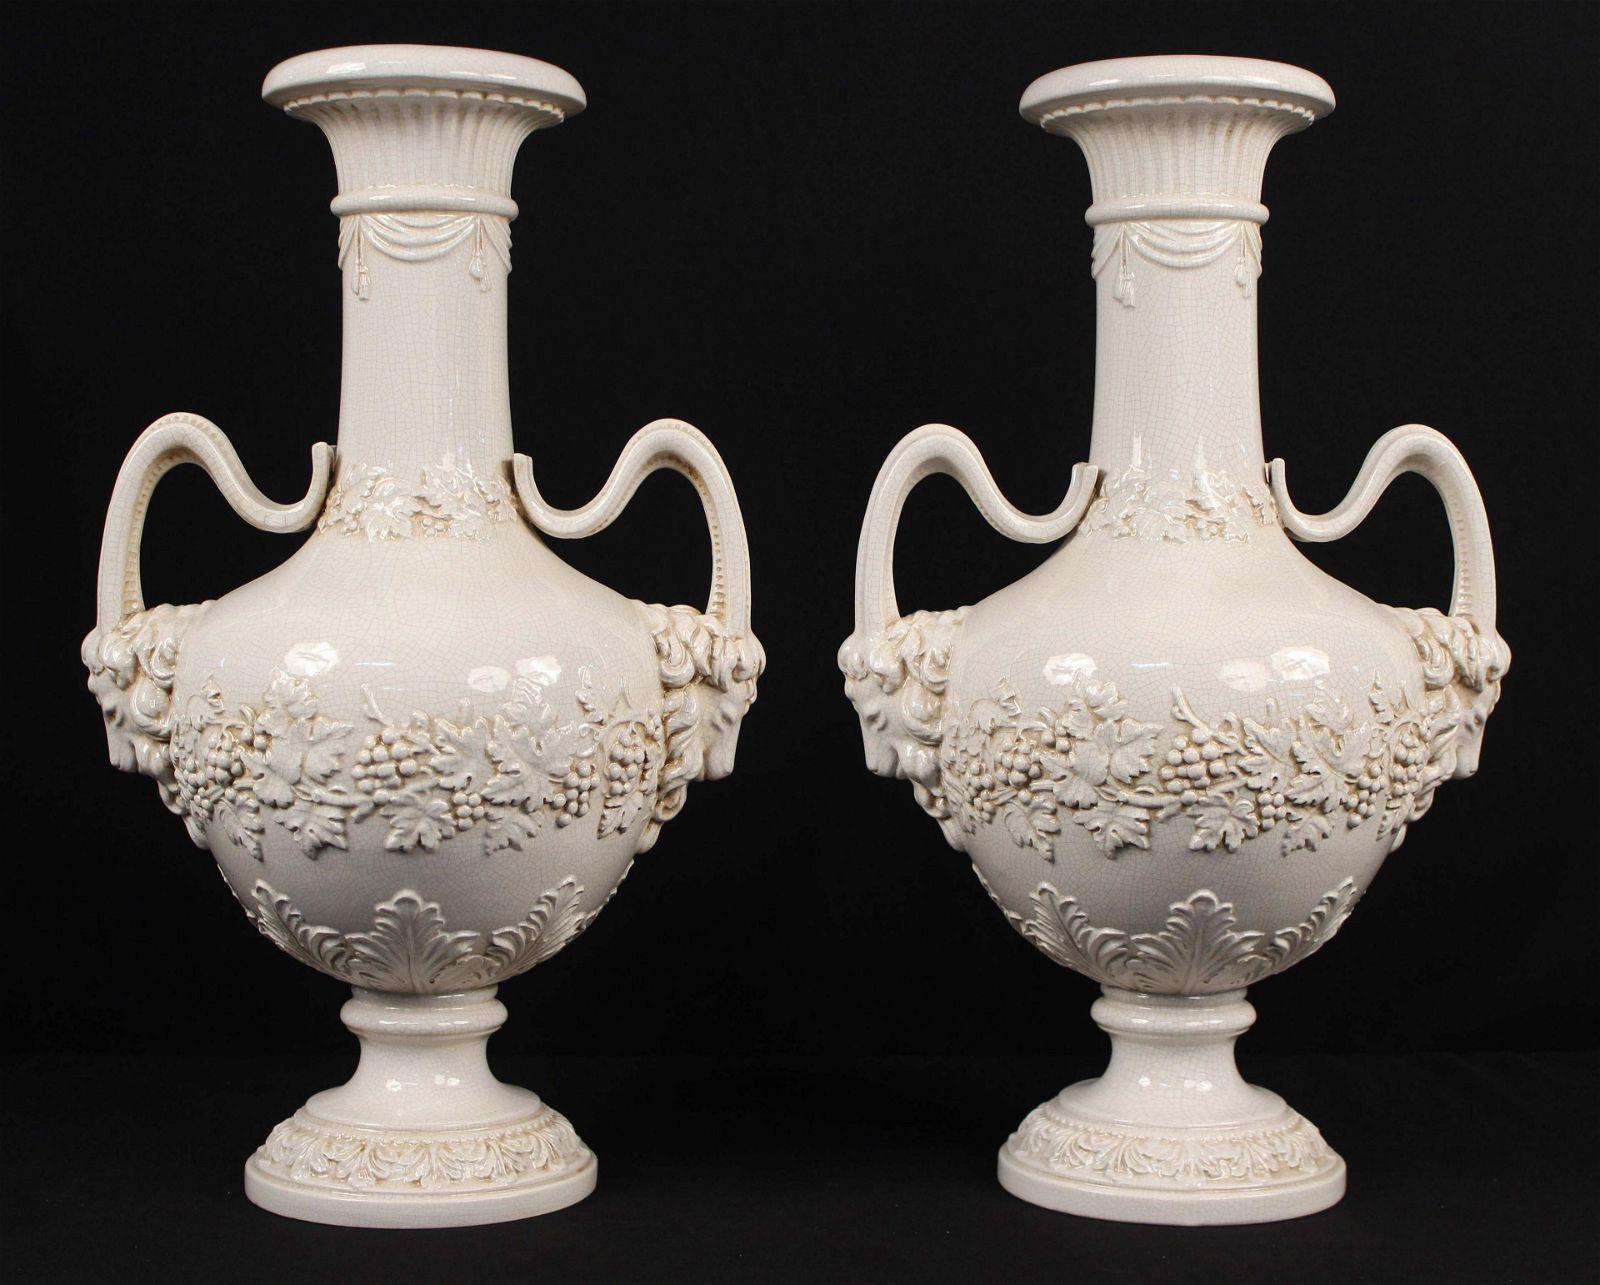 Pair of Italian Ceramic Urns w/ Ram Head Handles